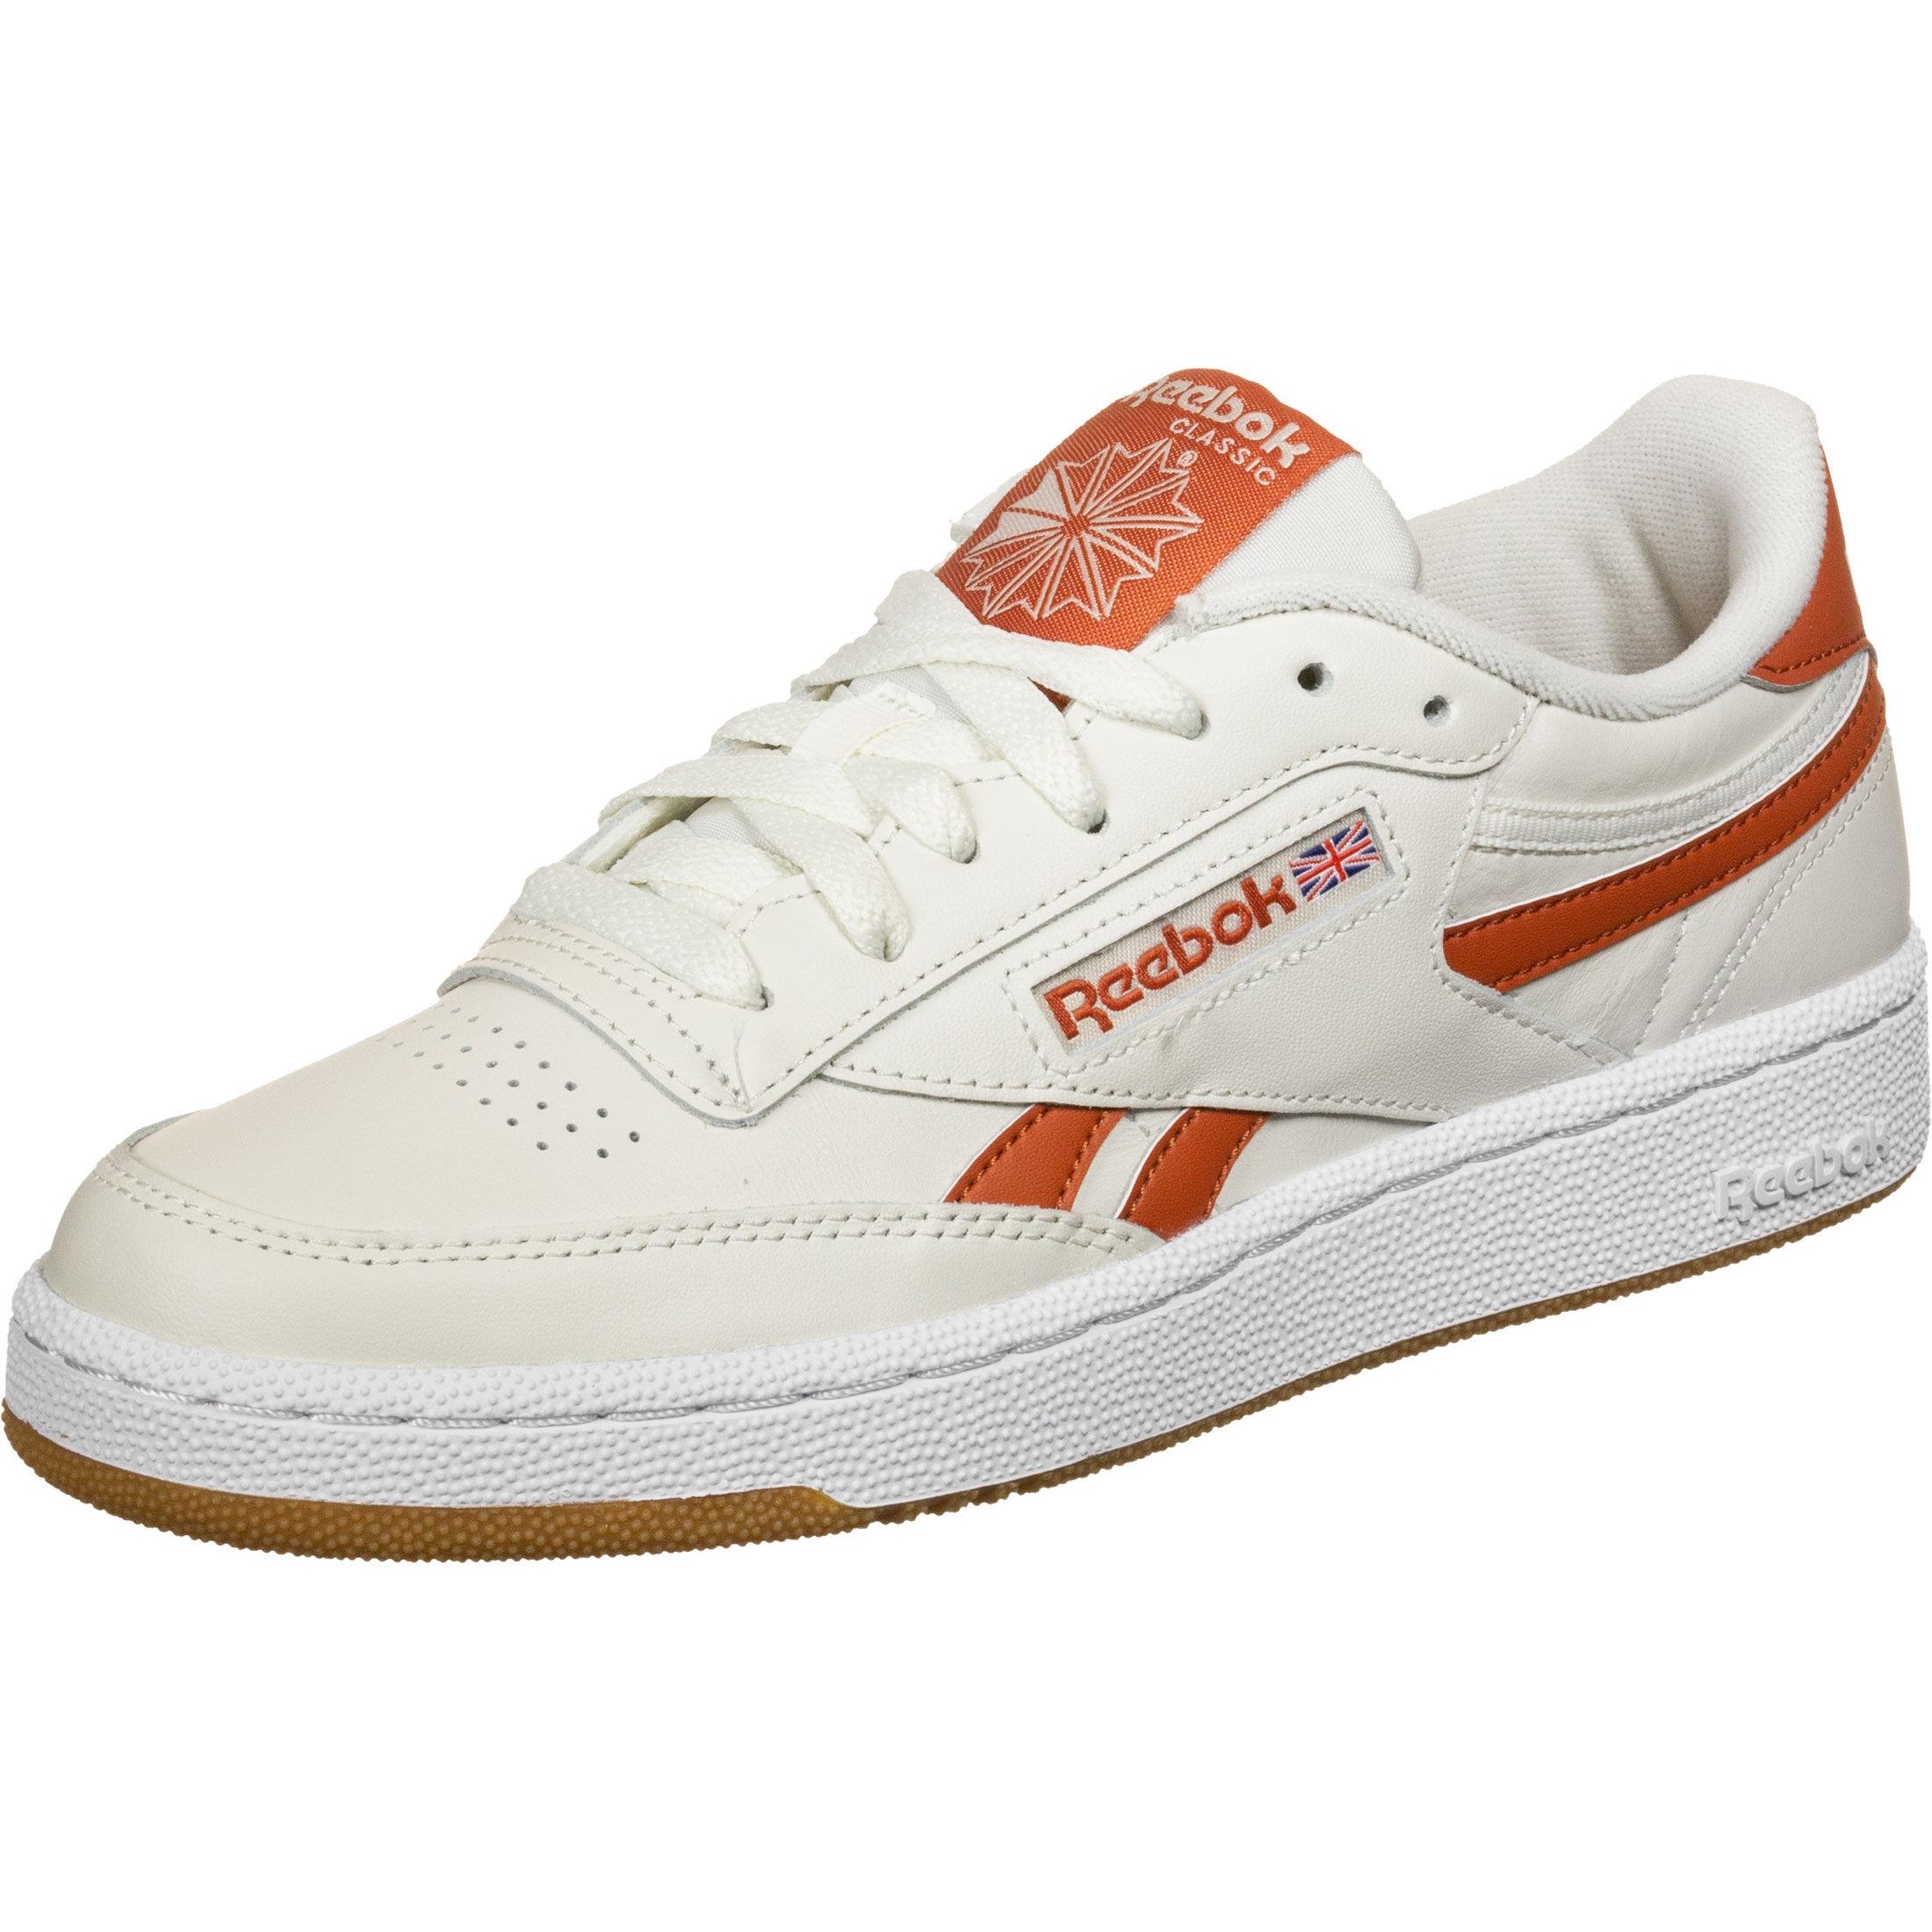 Reebok Club C Revenge - Sneakers Low at